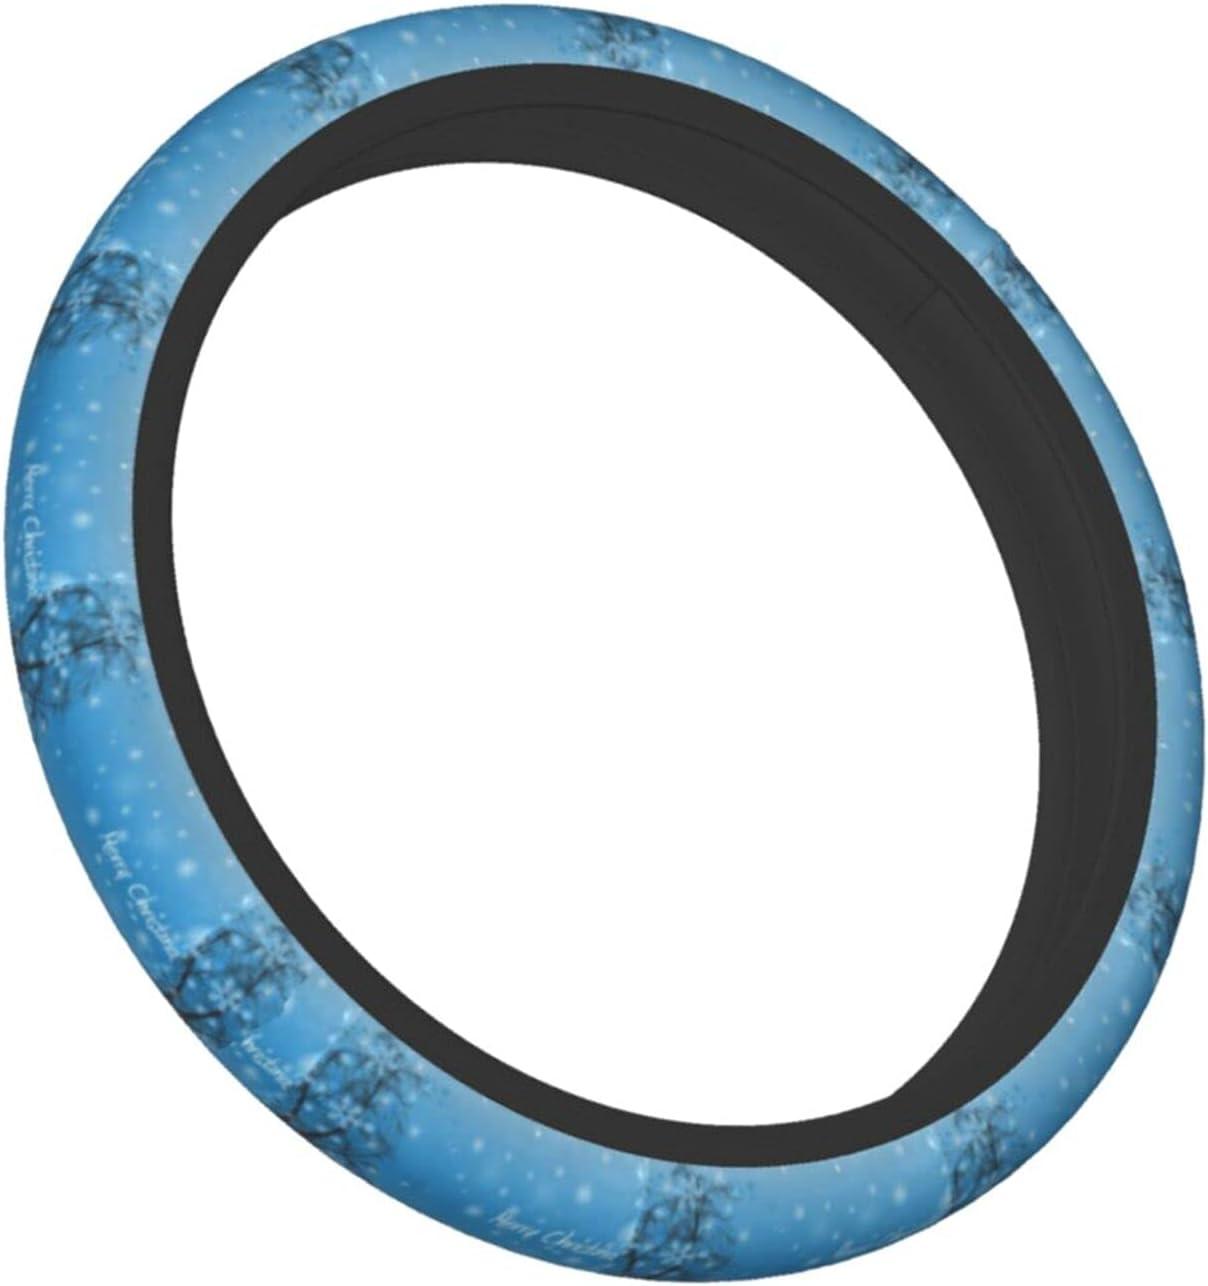 shipfree XfaithX Gift Boutique Blue supreme Merry Steering Christmas Wheel Co Car